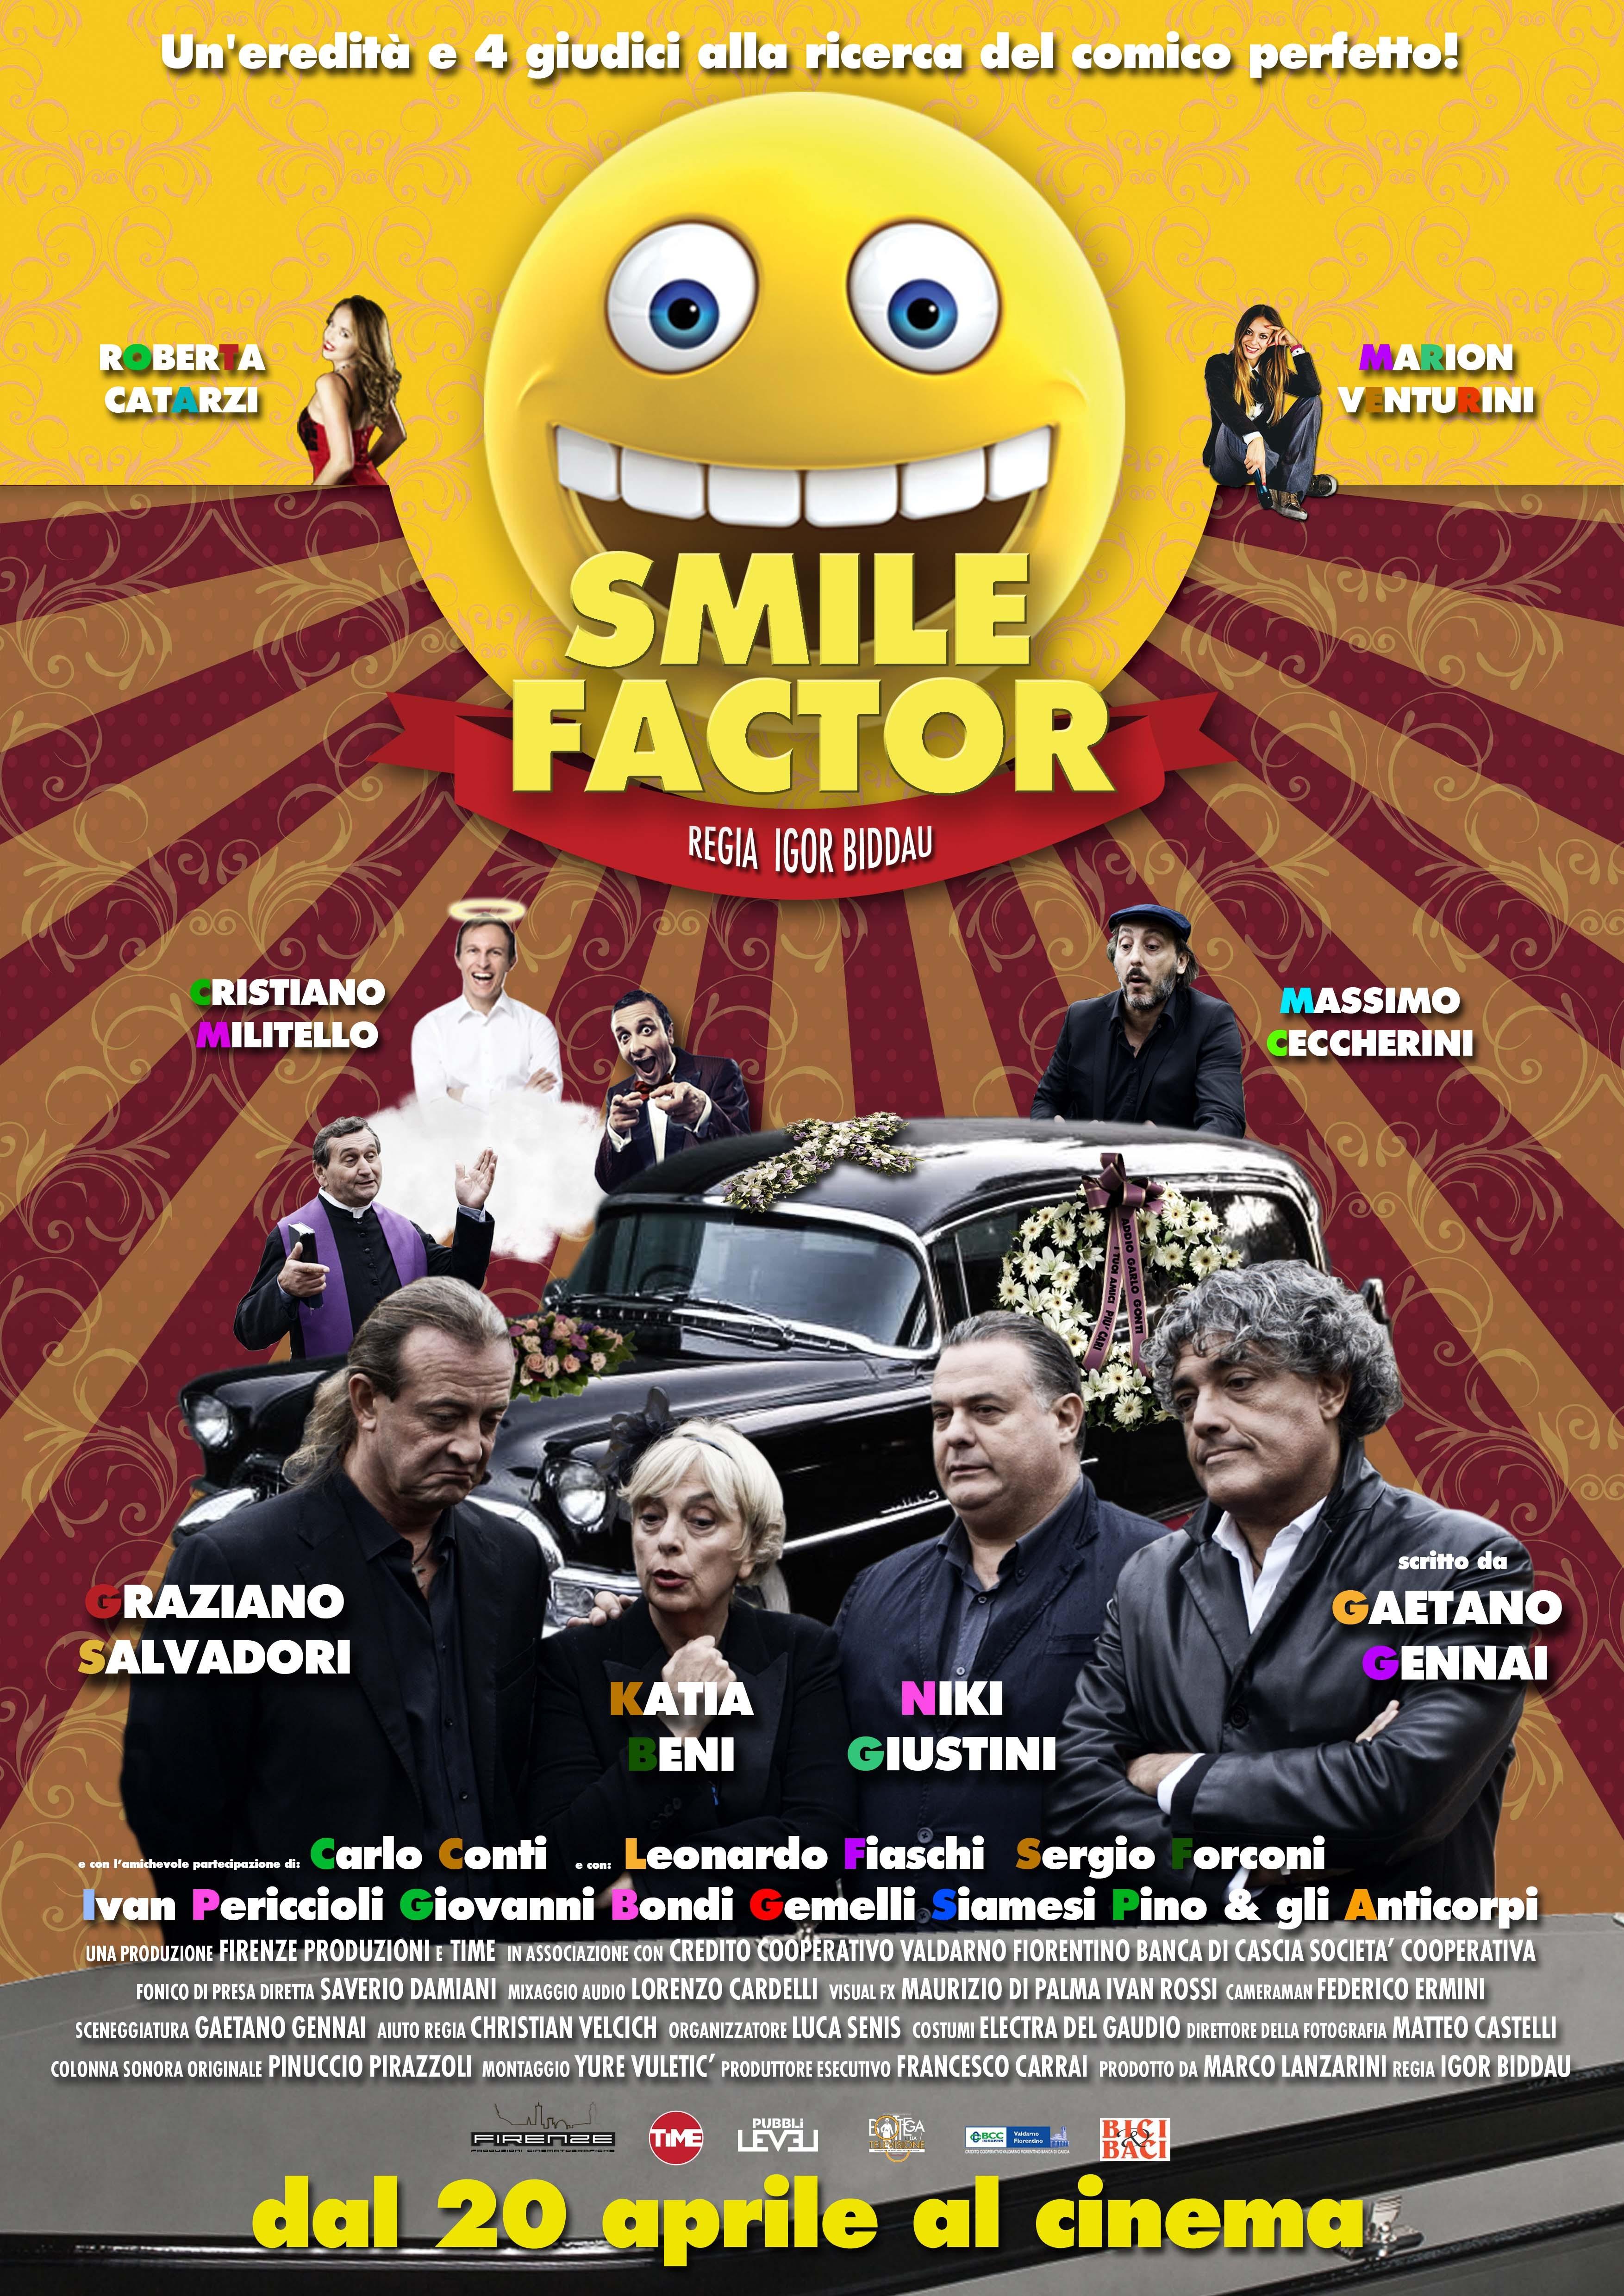 Smile Factor